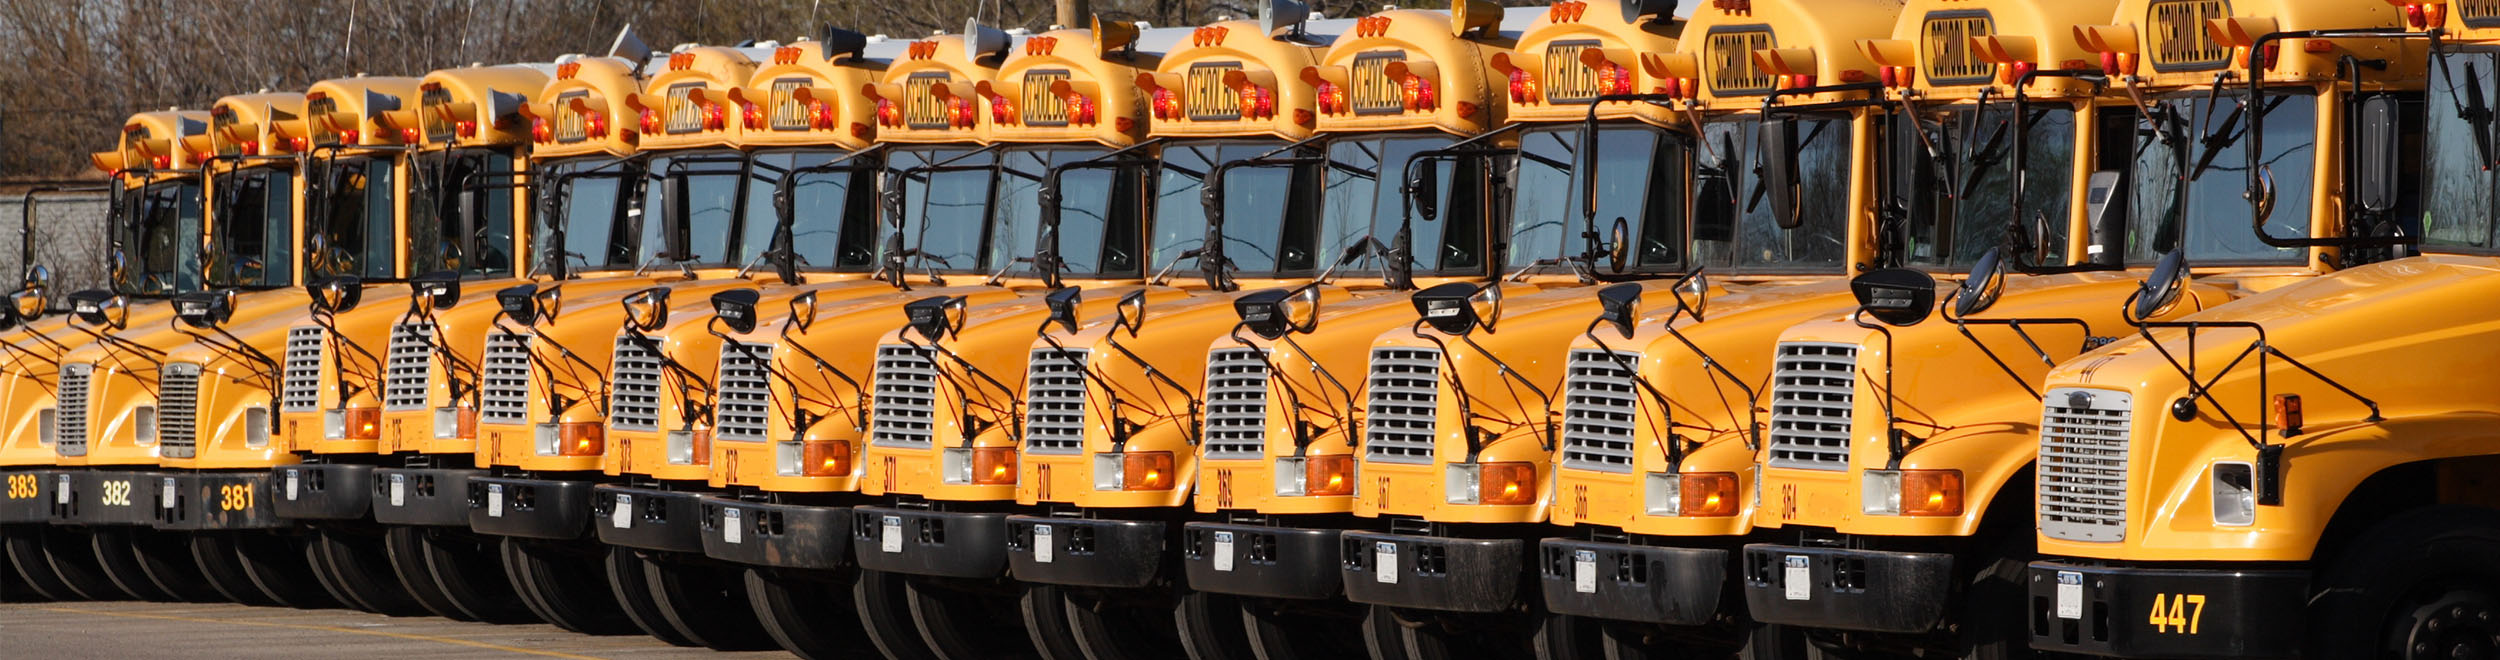 bus-transportation-management-products.jpg